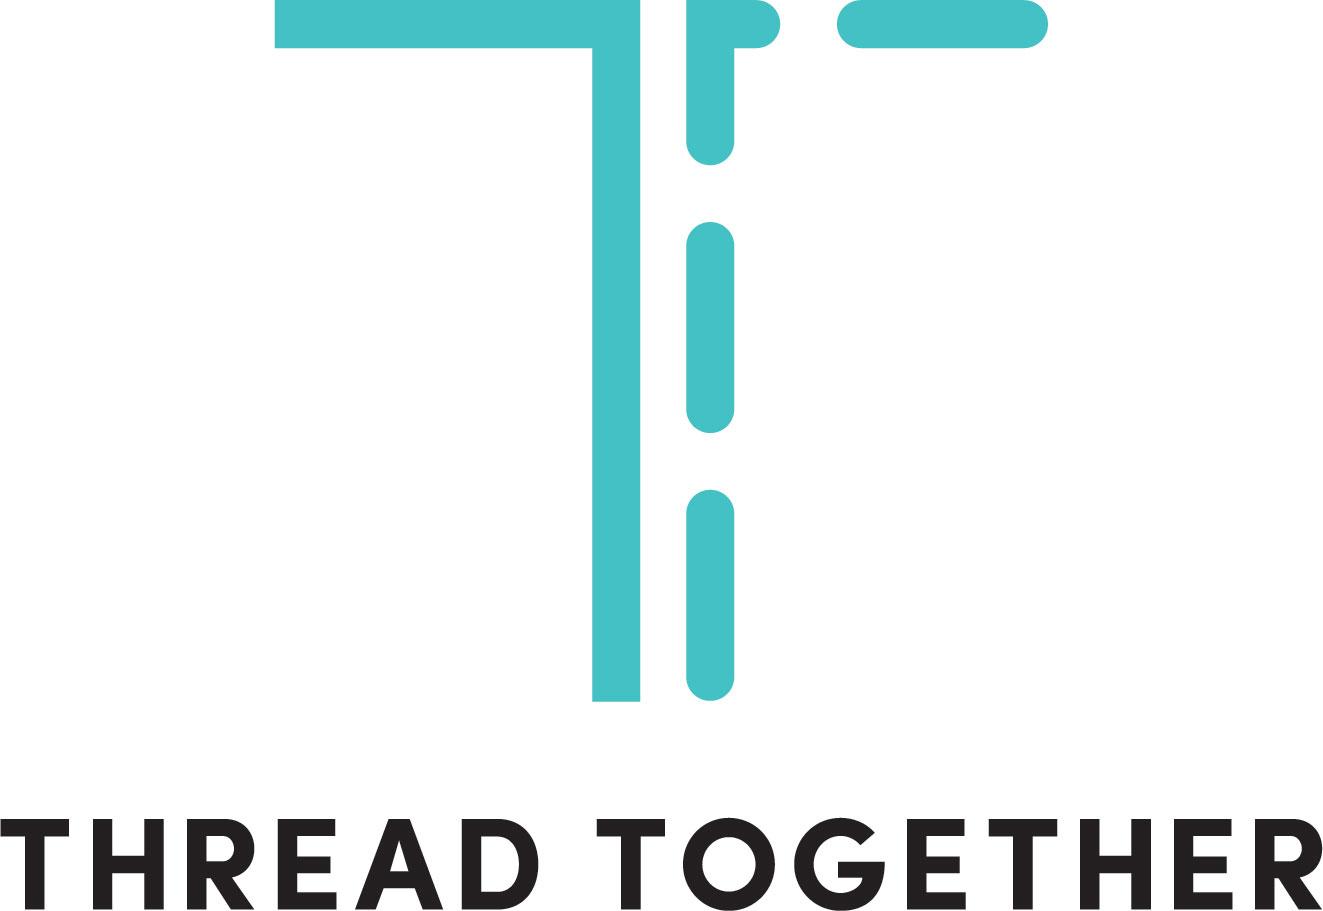 Thread Together